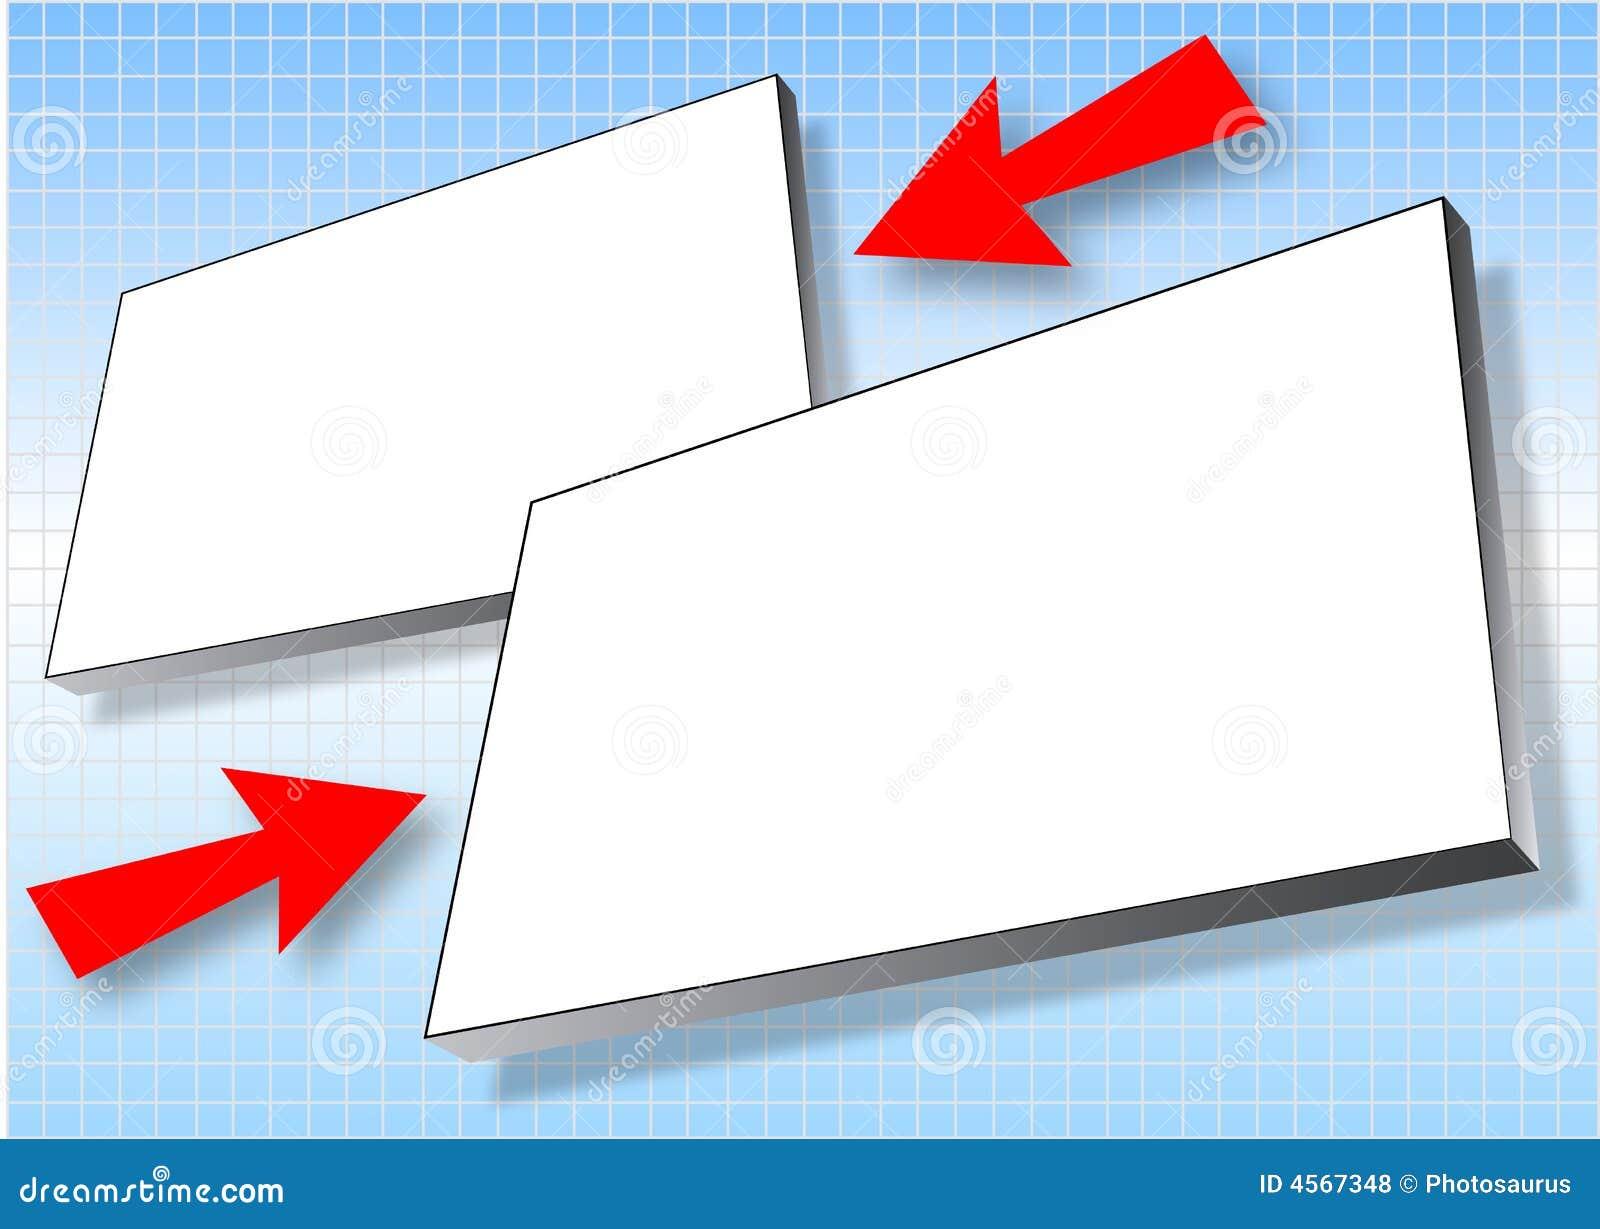 illastator how to put an arrow